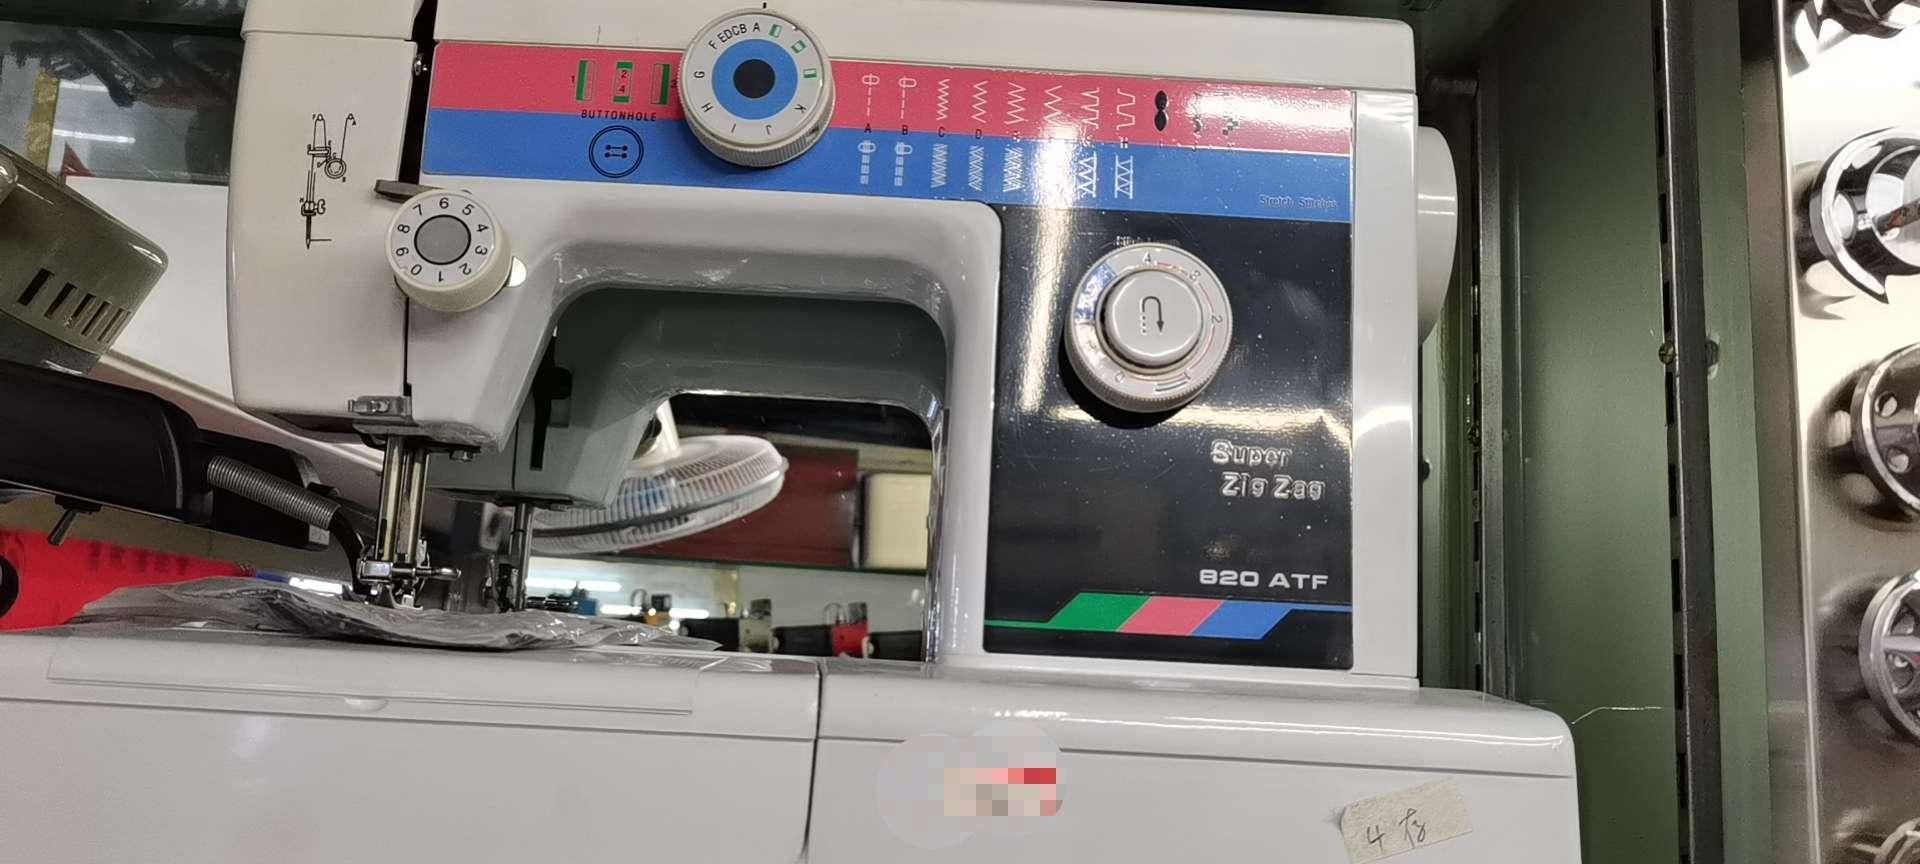 820ATF缝纫机